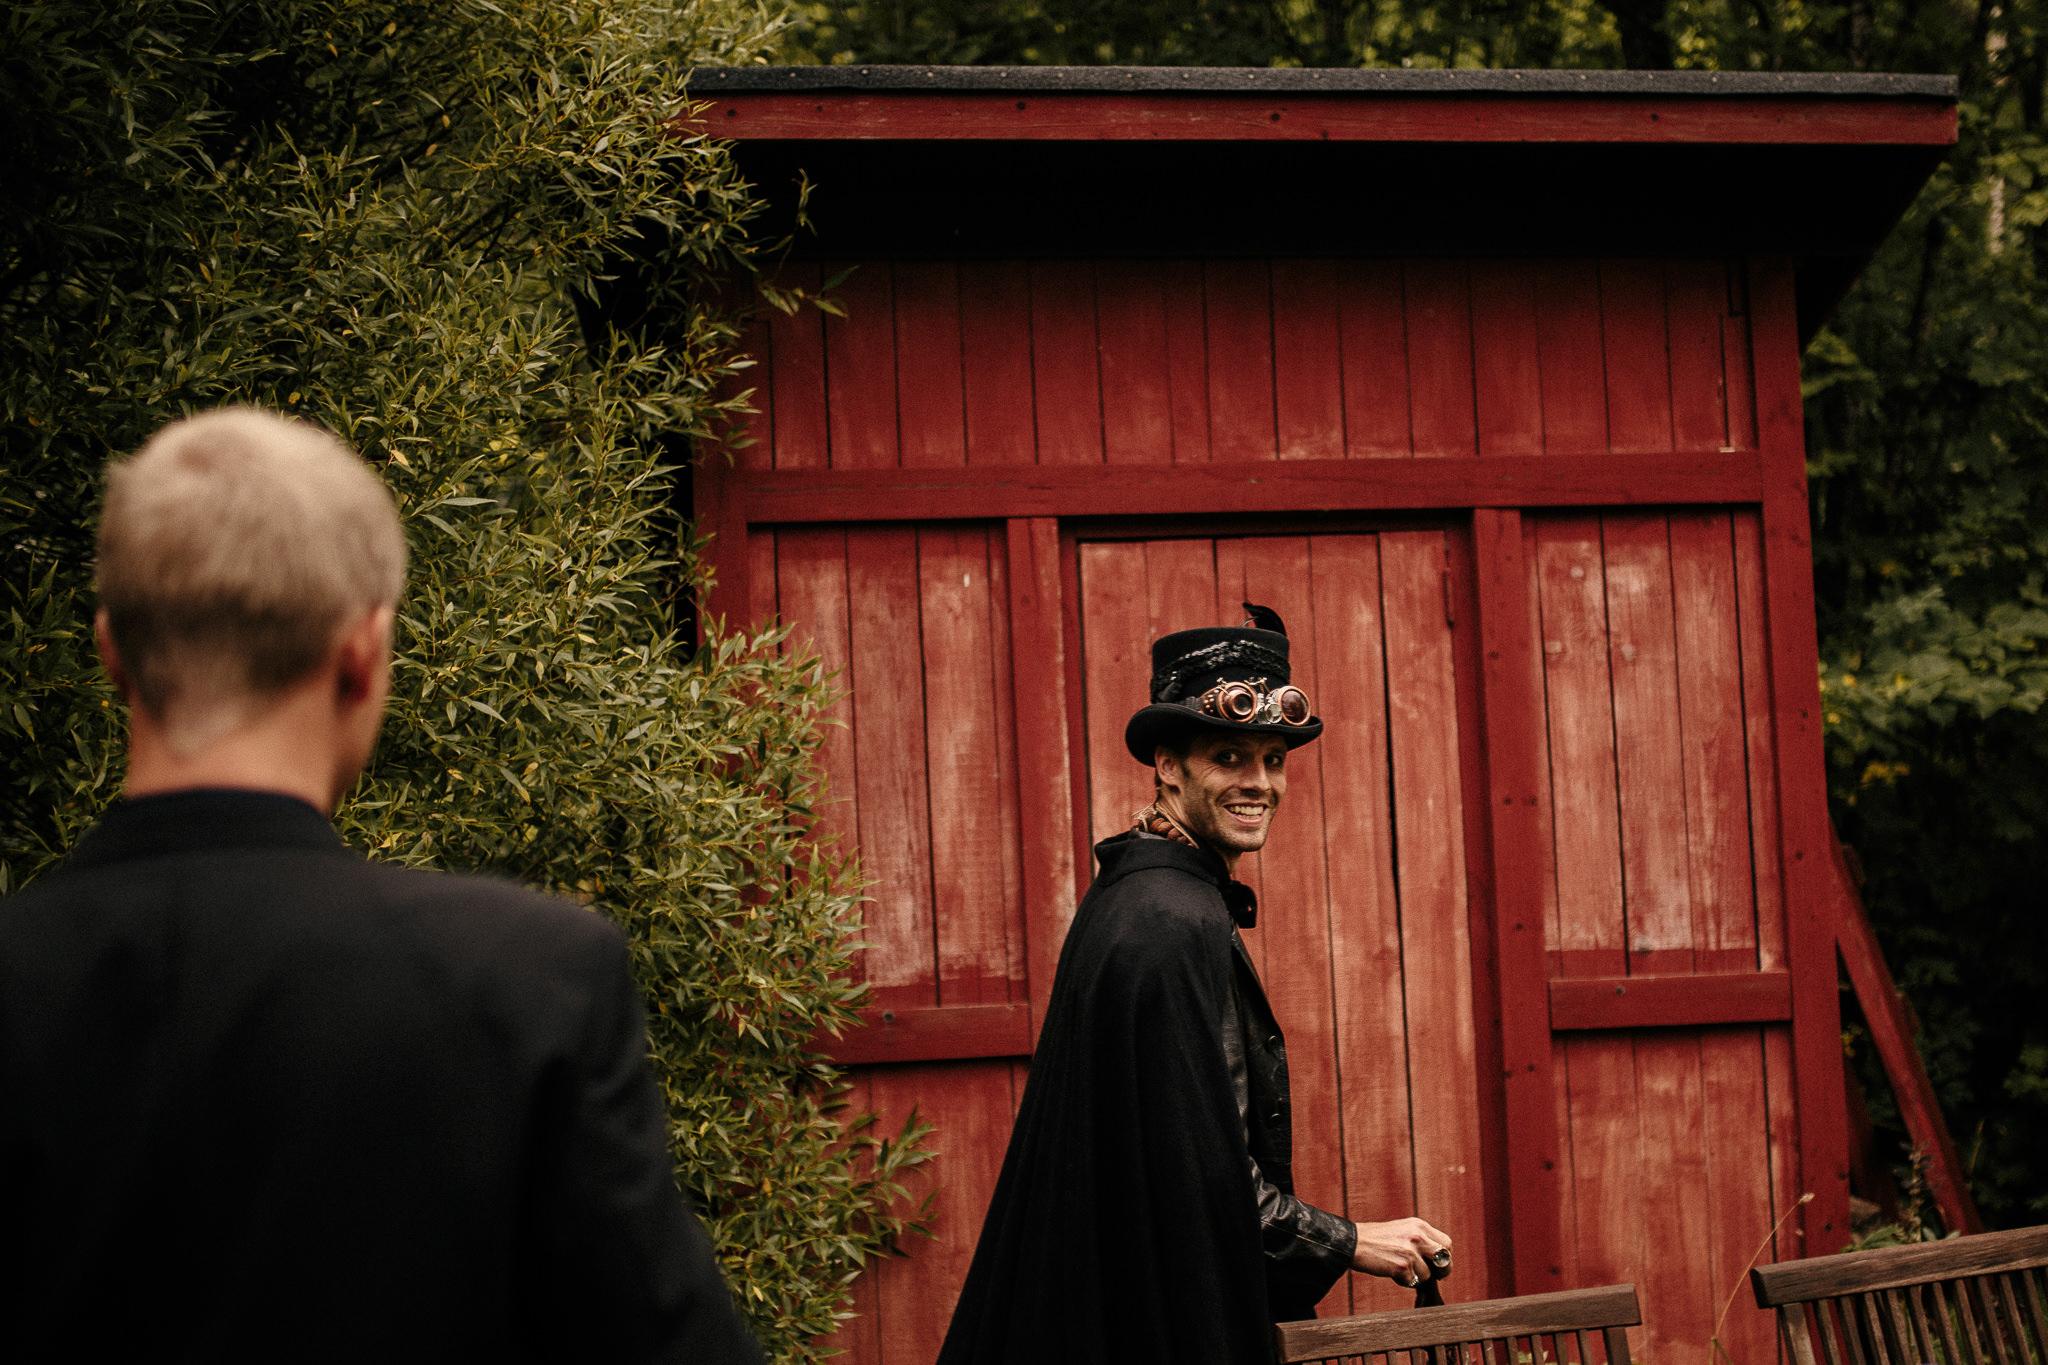 Ceren & Jani - Finland Wedding Photographer - Weddings by Qay - Wedding Photographer (81 of 166).jpg